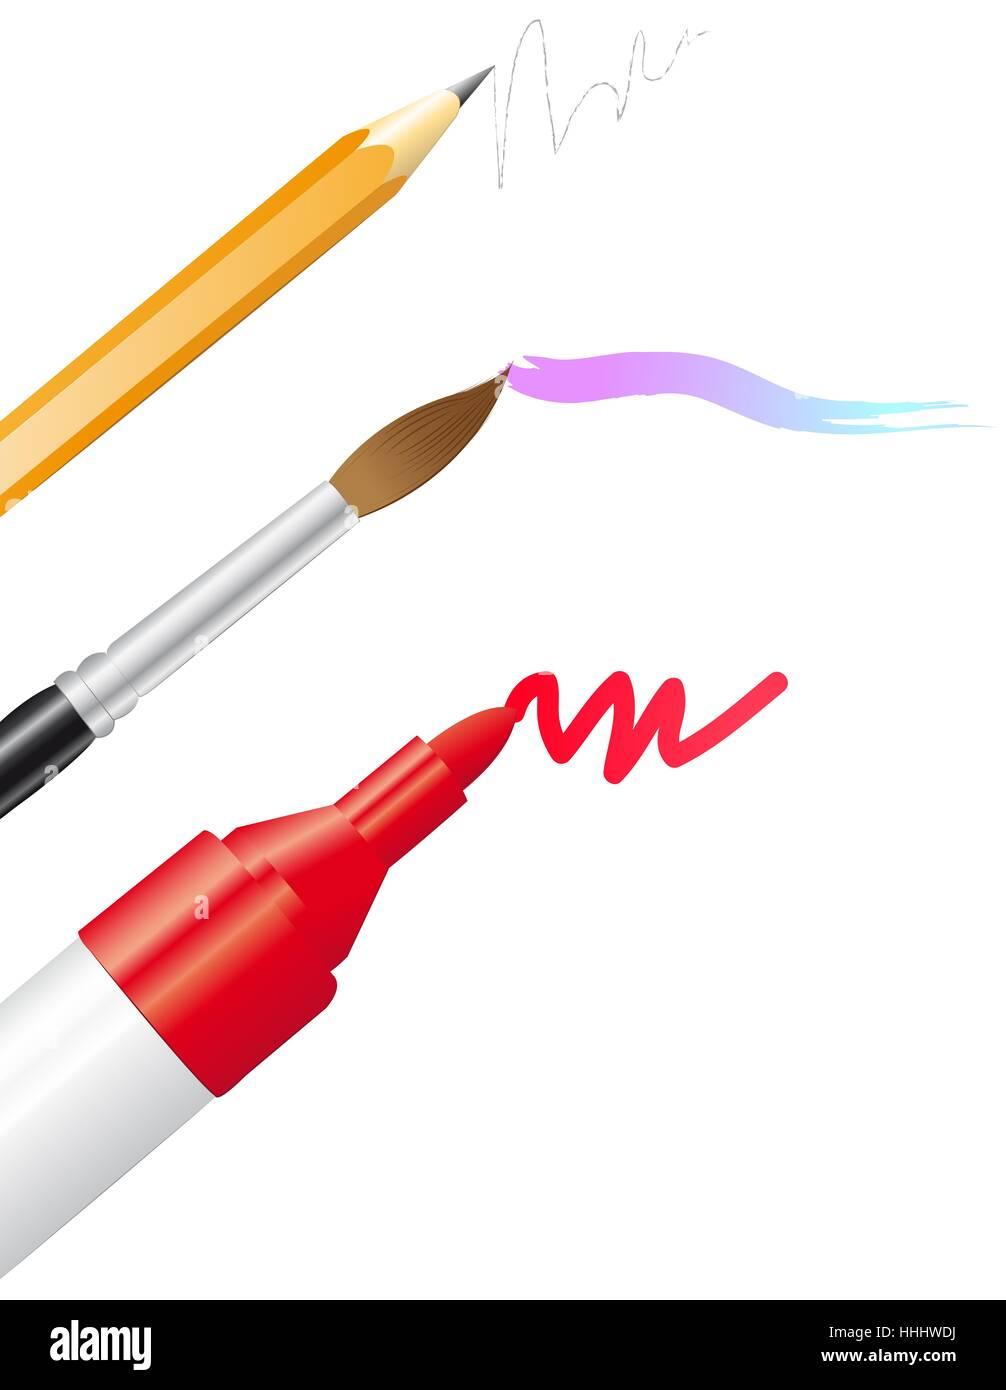 Mark Pencil Pen Style Paint Letter Draw Marker Paintbrush Brush Blue